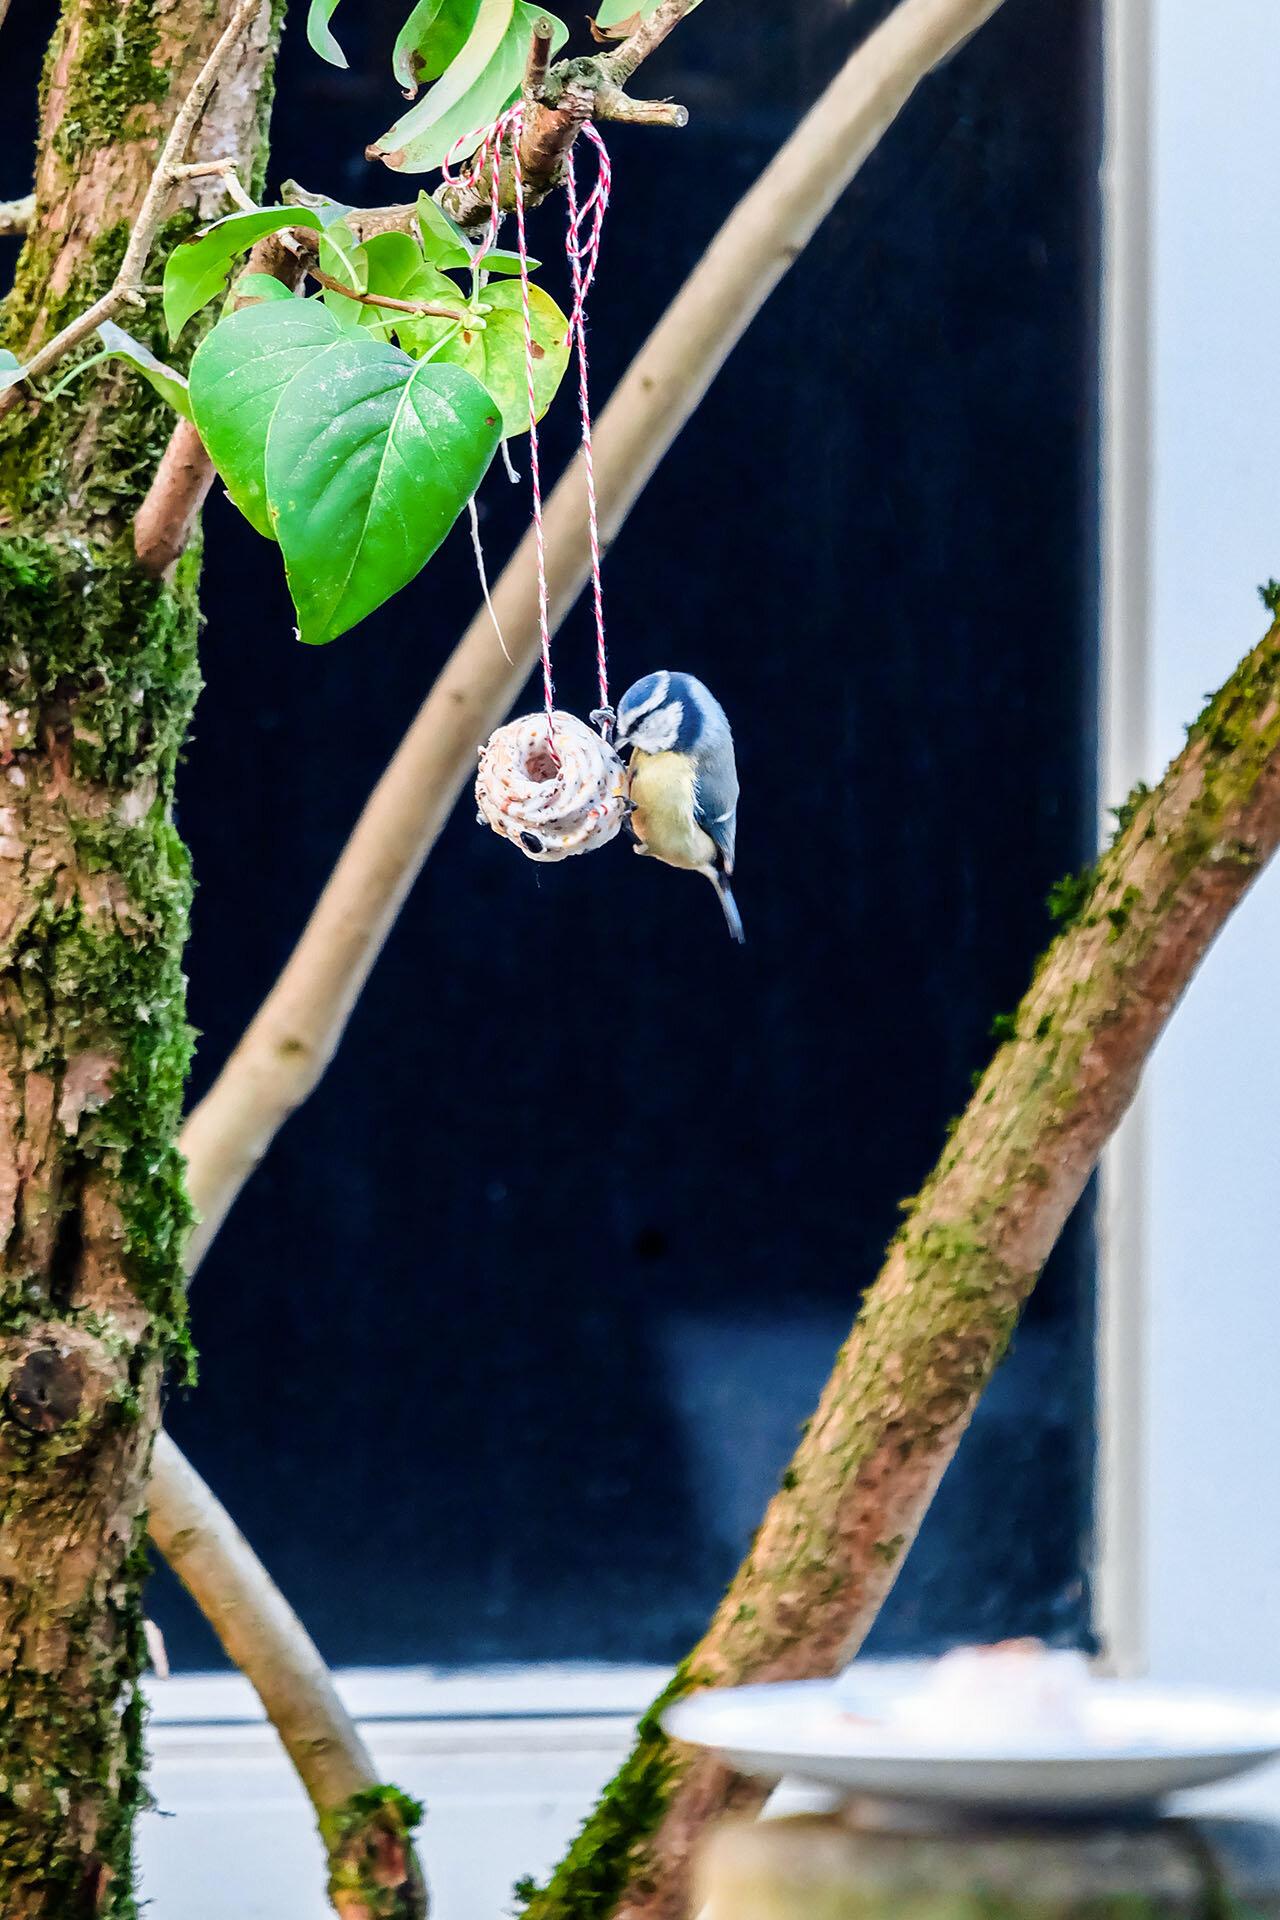 Vogel aan taartje.jpg